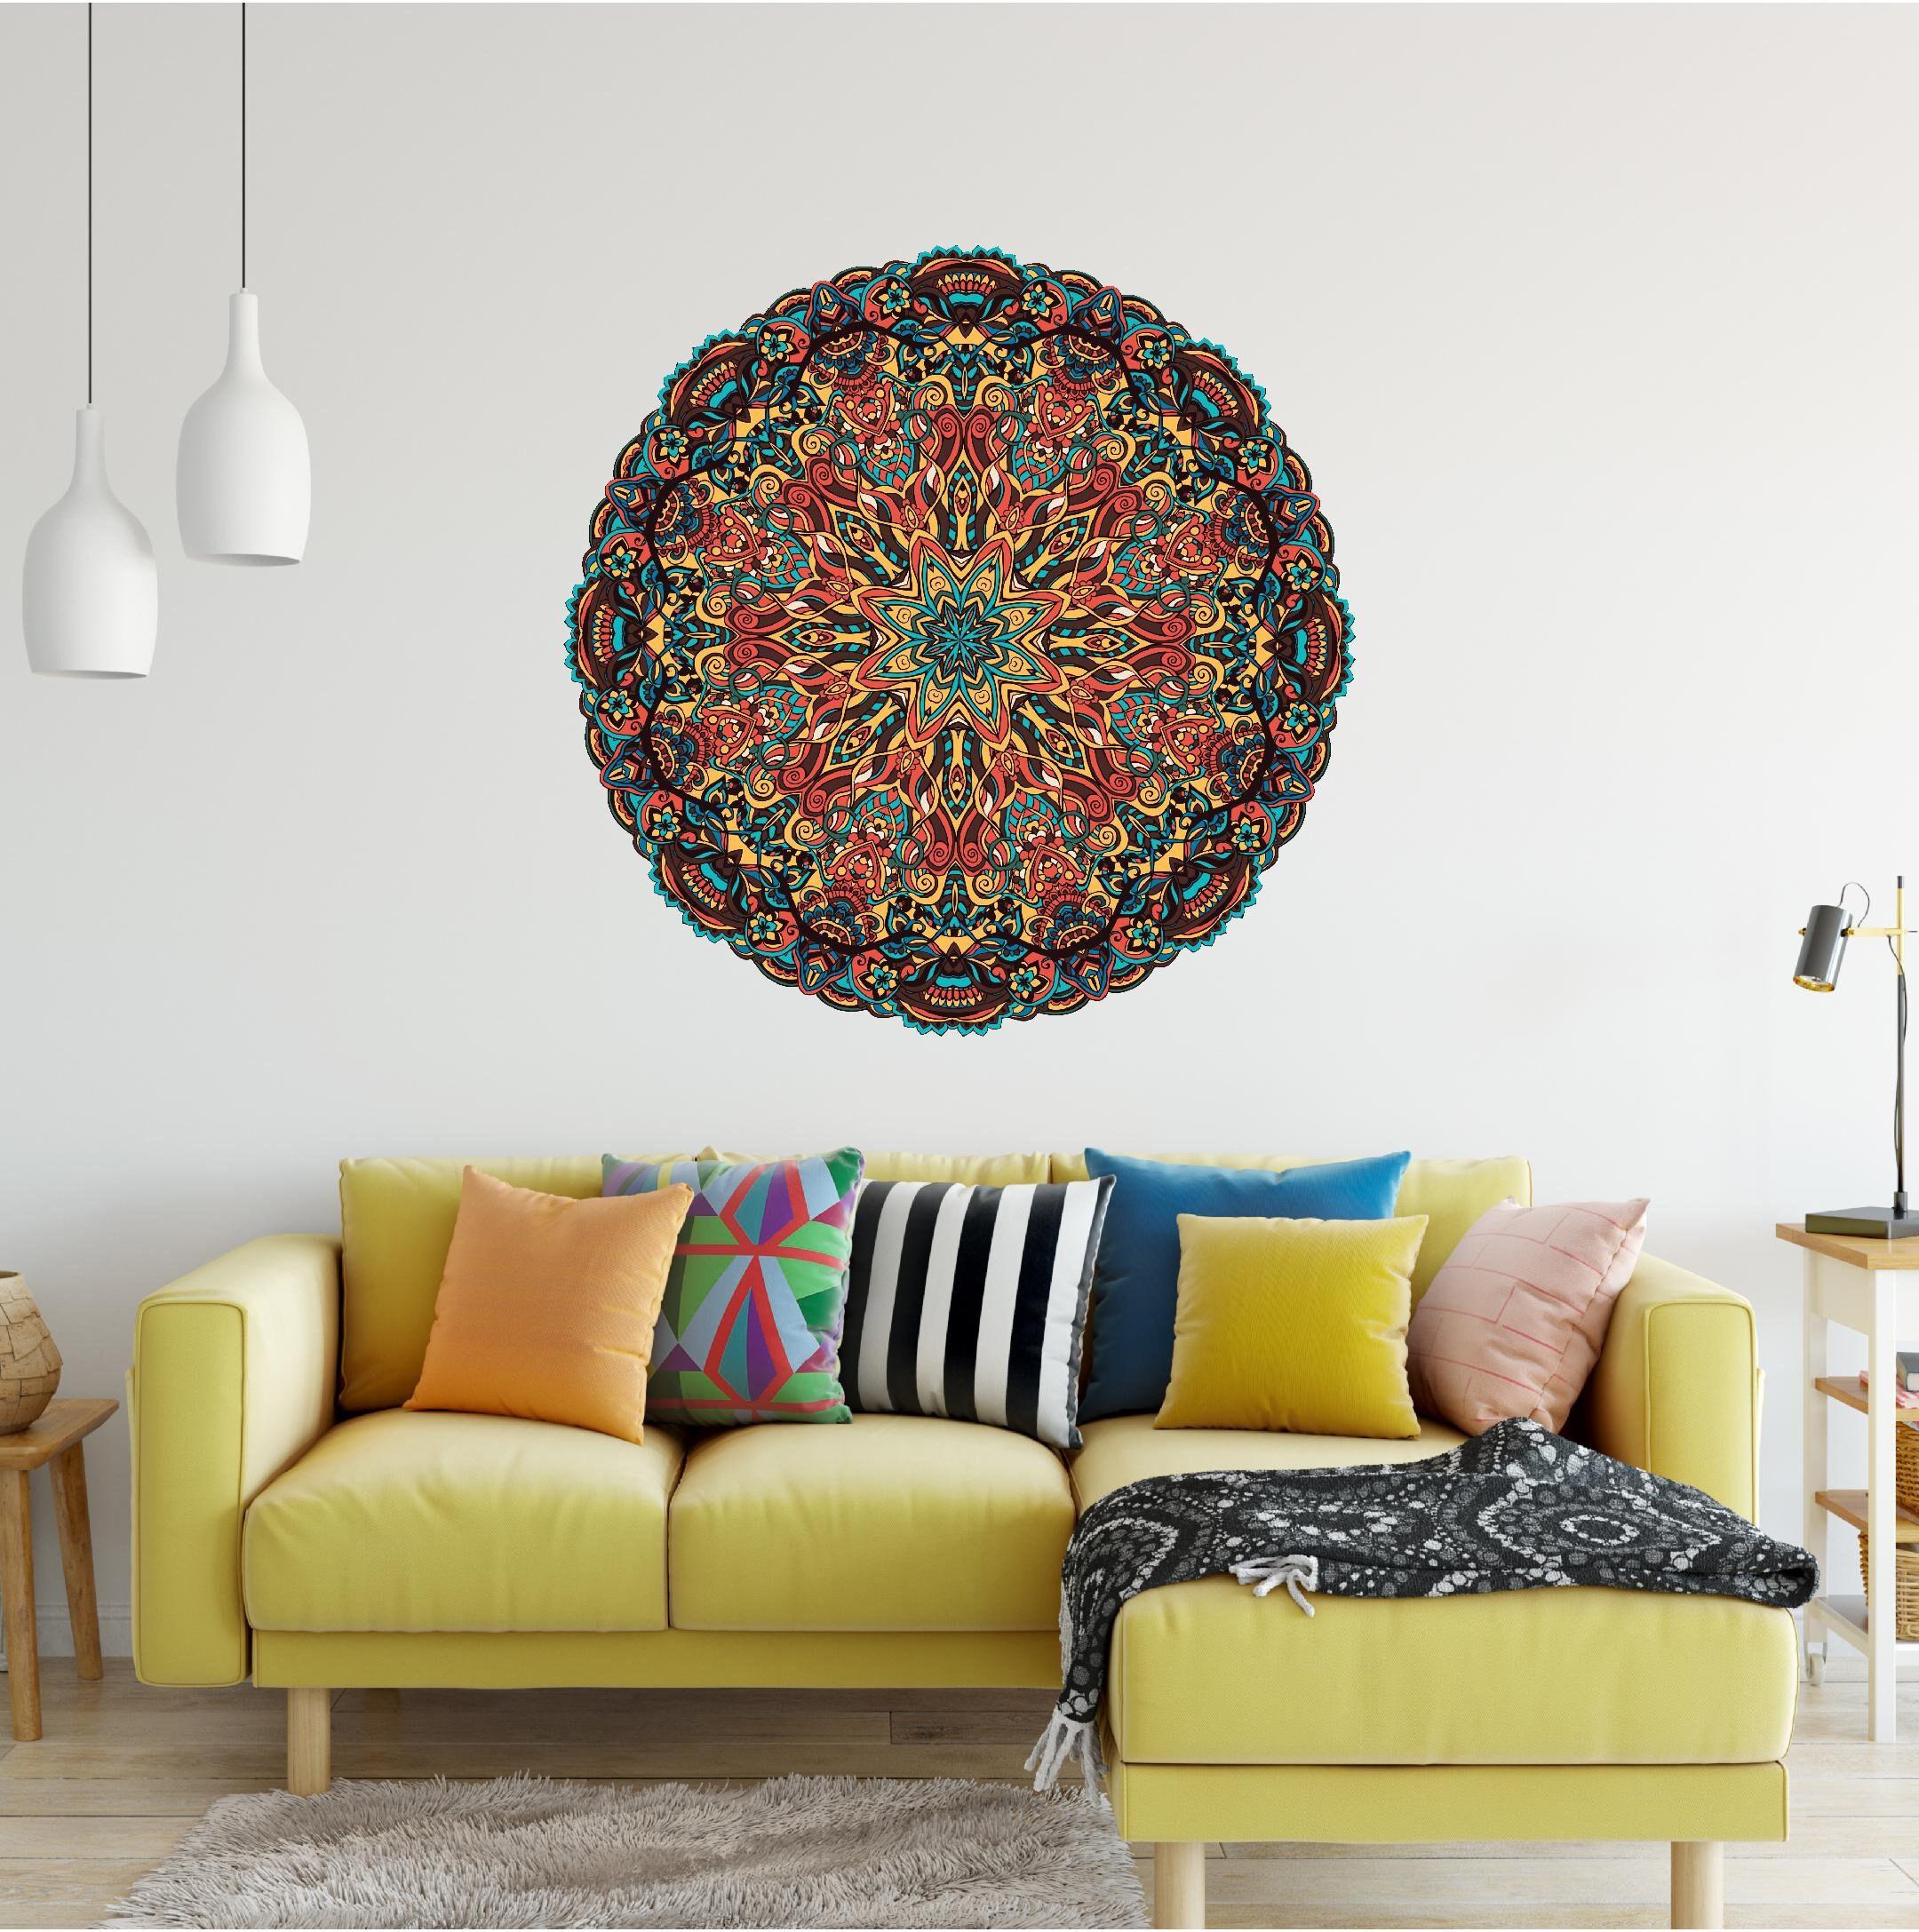 Peel and Stick Removable Vinyl Wall Sticker Yoga Studio Decor Bohemian Tapestry Wall Art Mandala Wall Decal #18 Mandala Tapestry